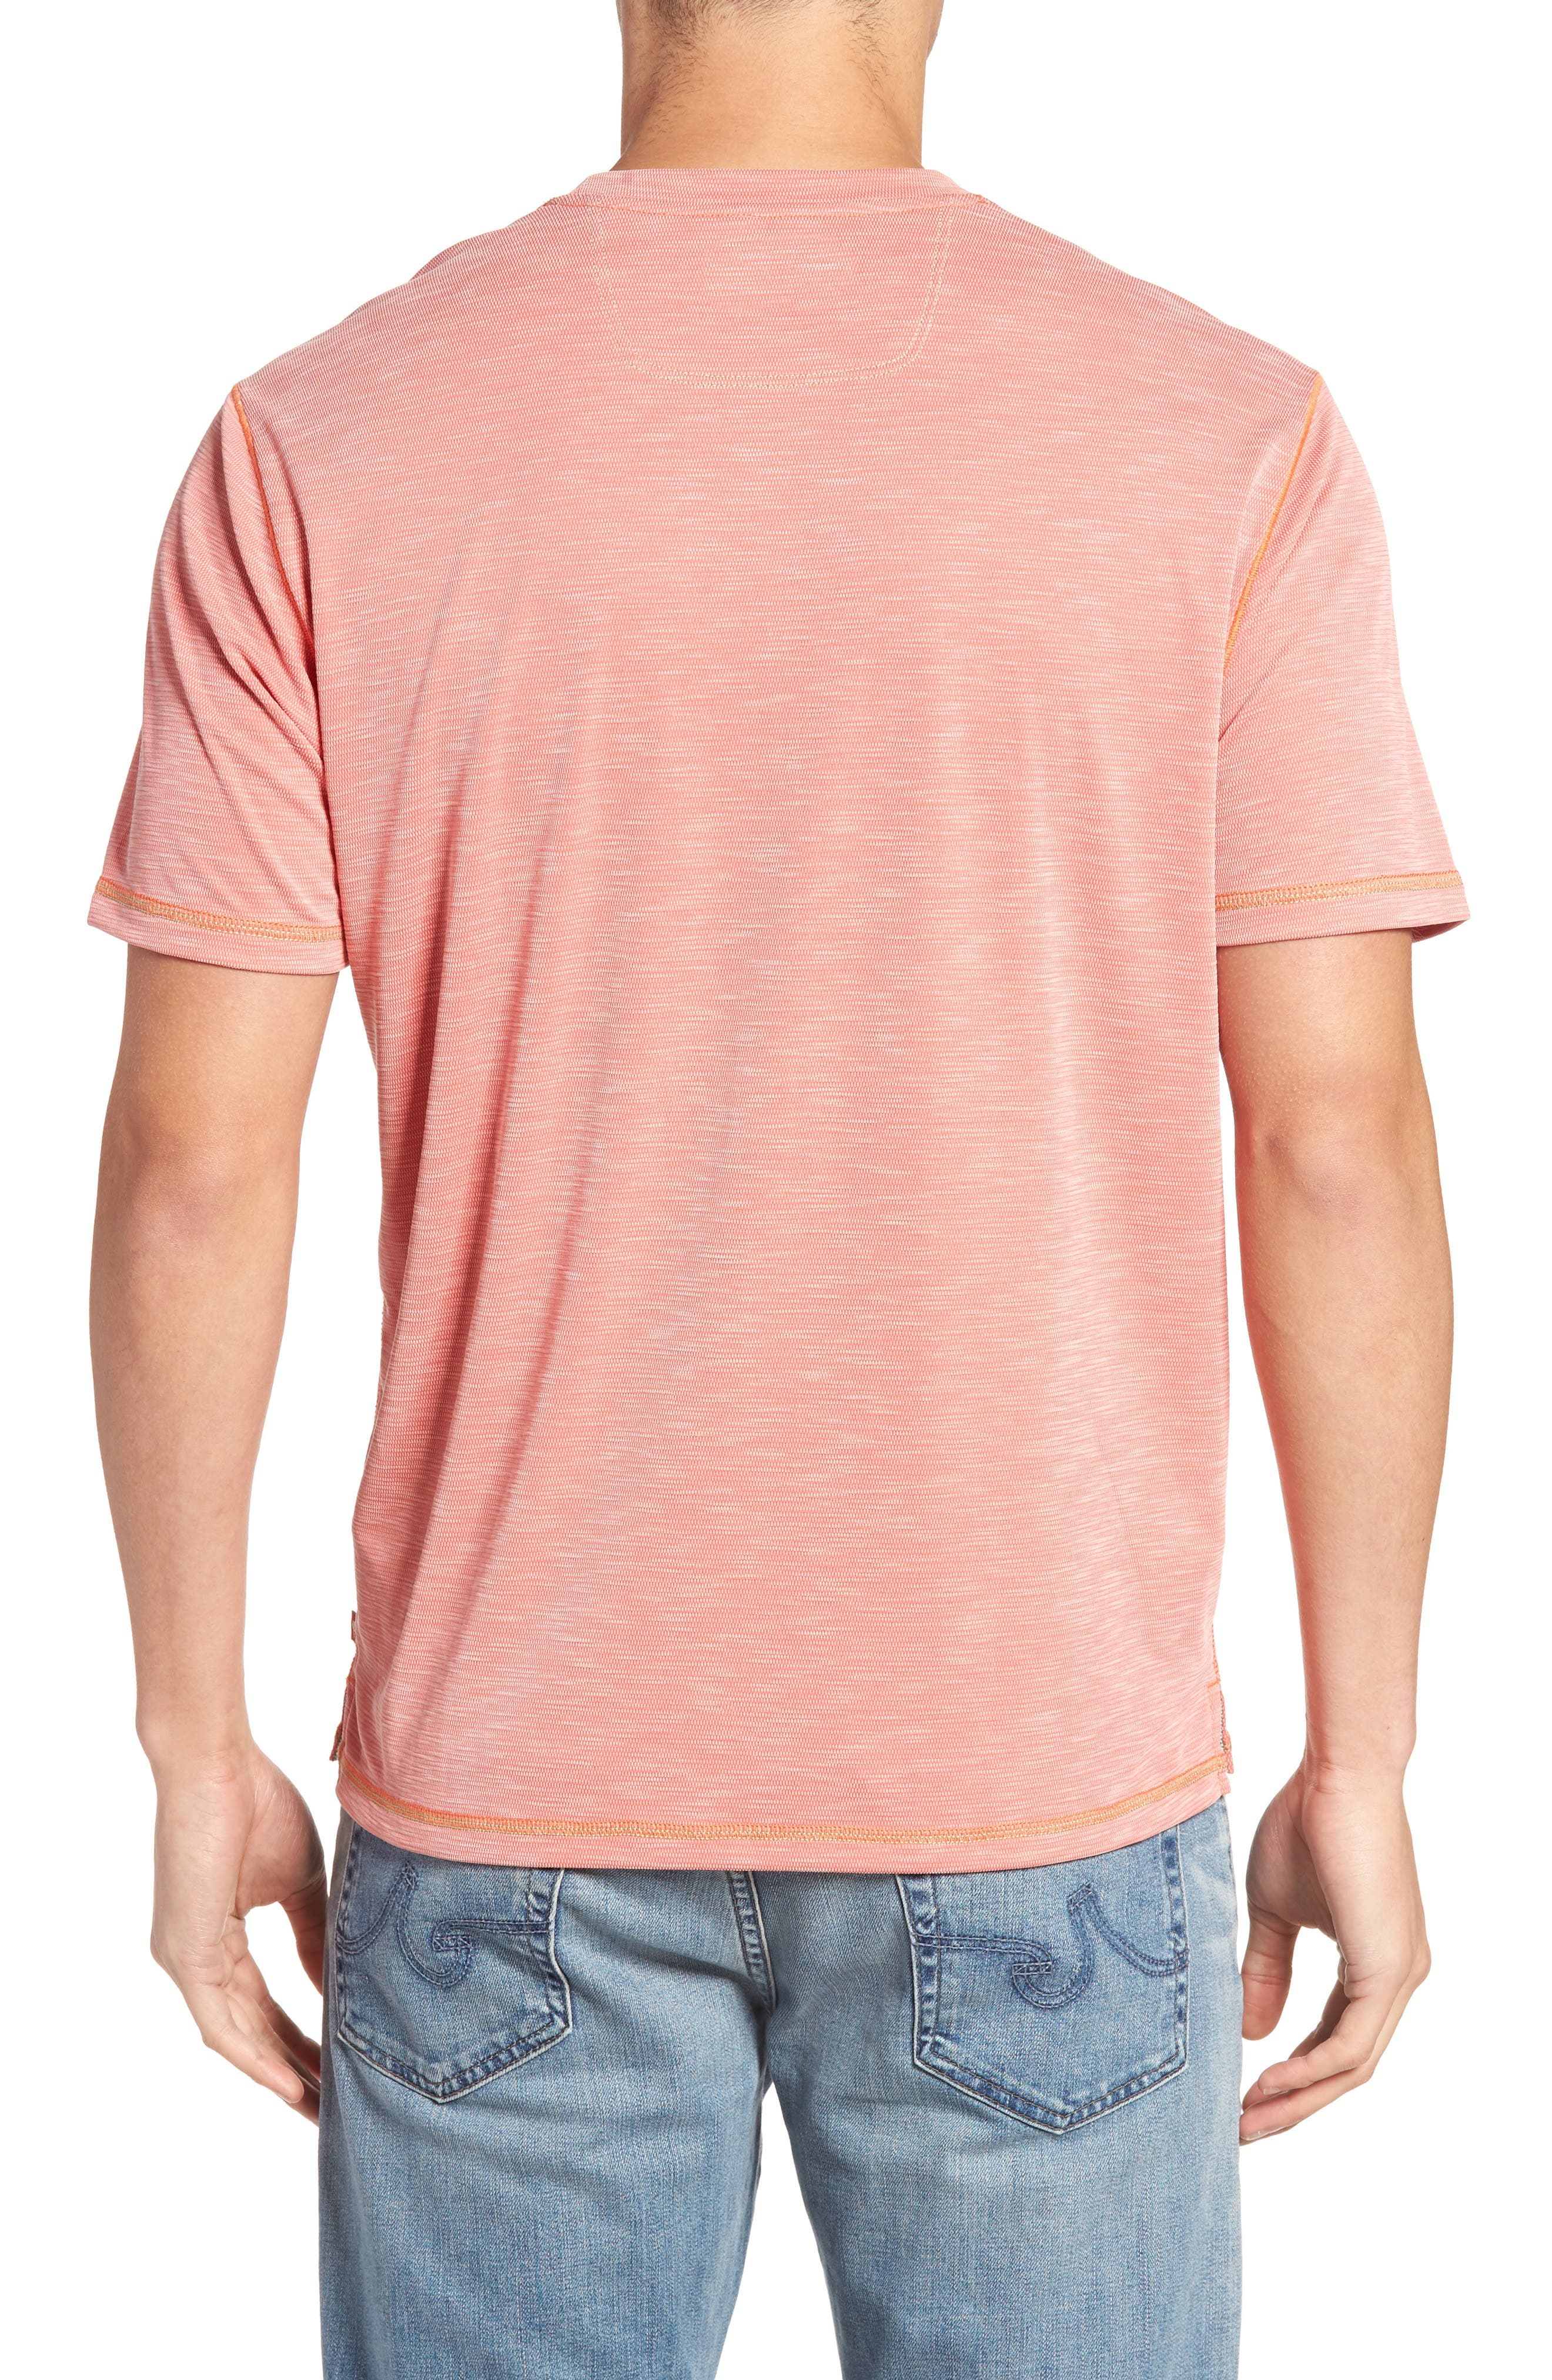 Paradise Around Crewneck T-Shirt,                             Alternate thumbnail 2, color,                             Fusion